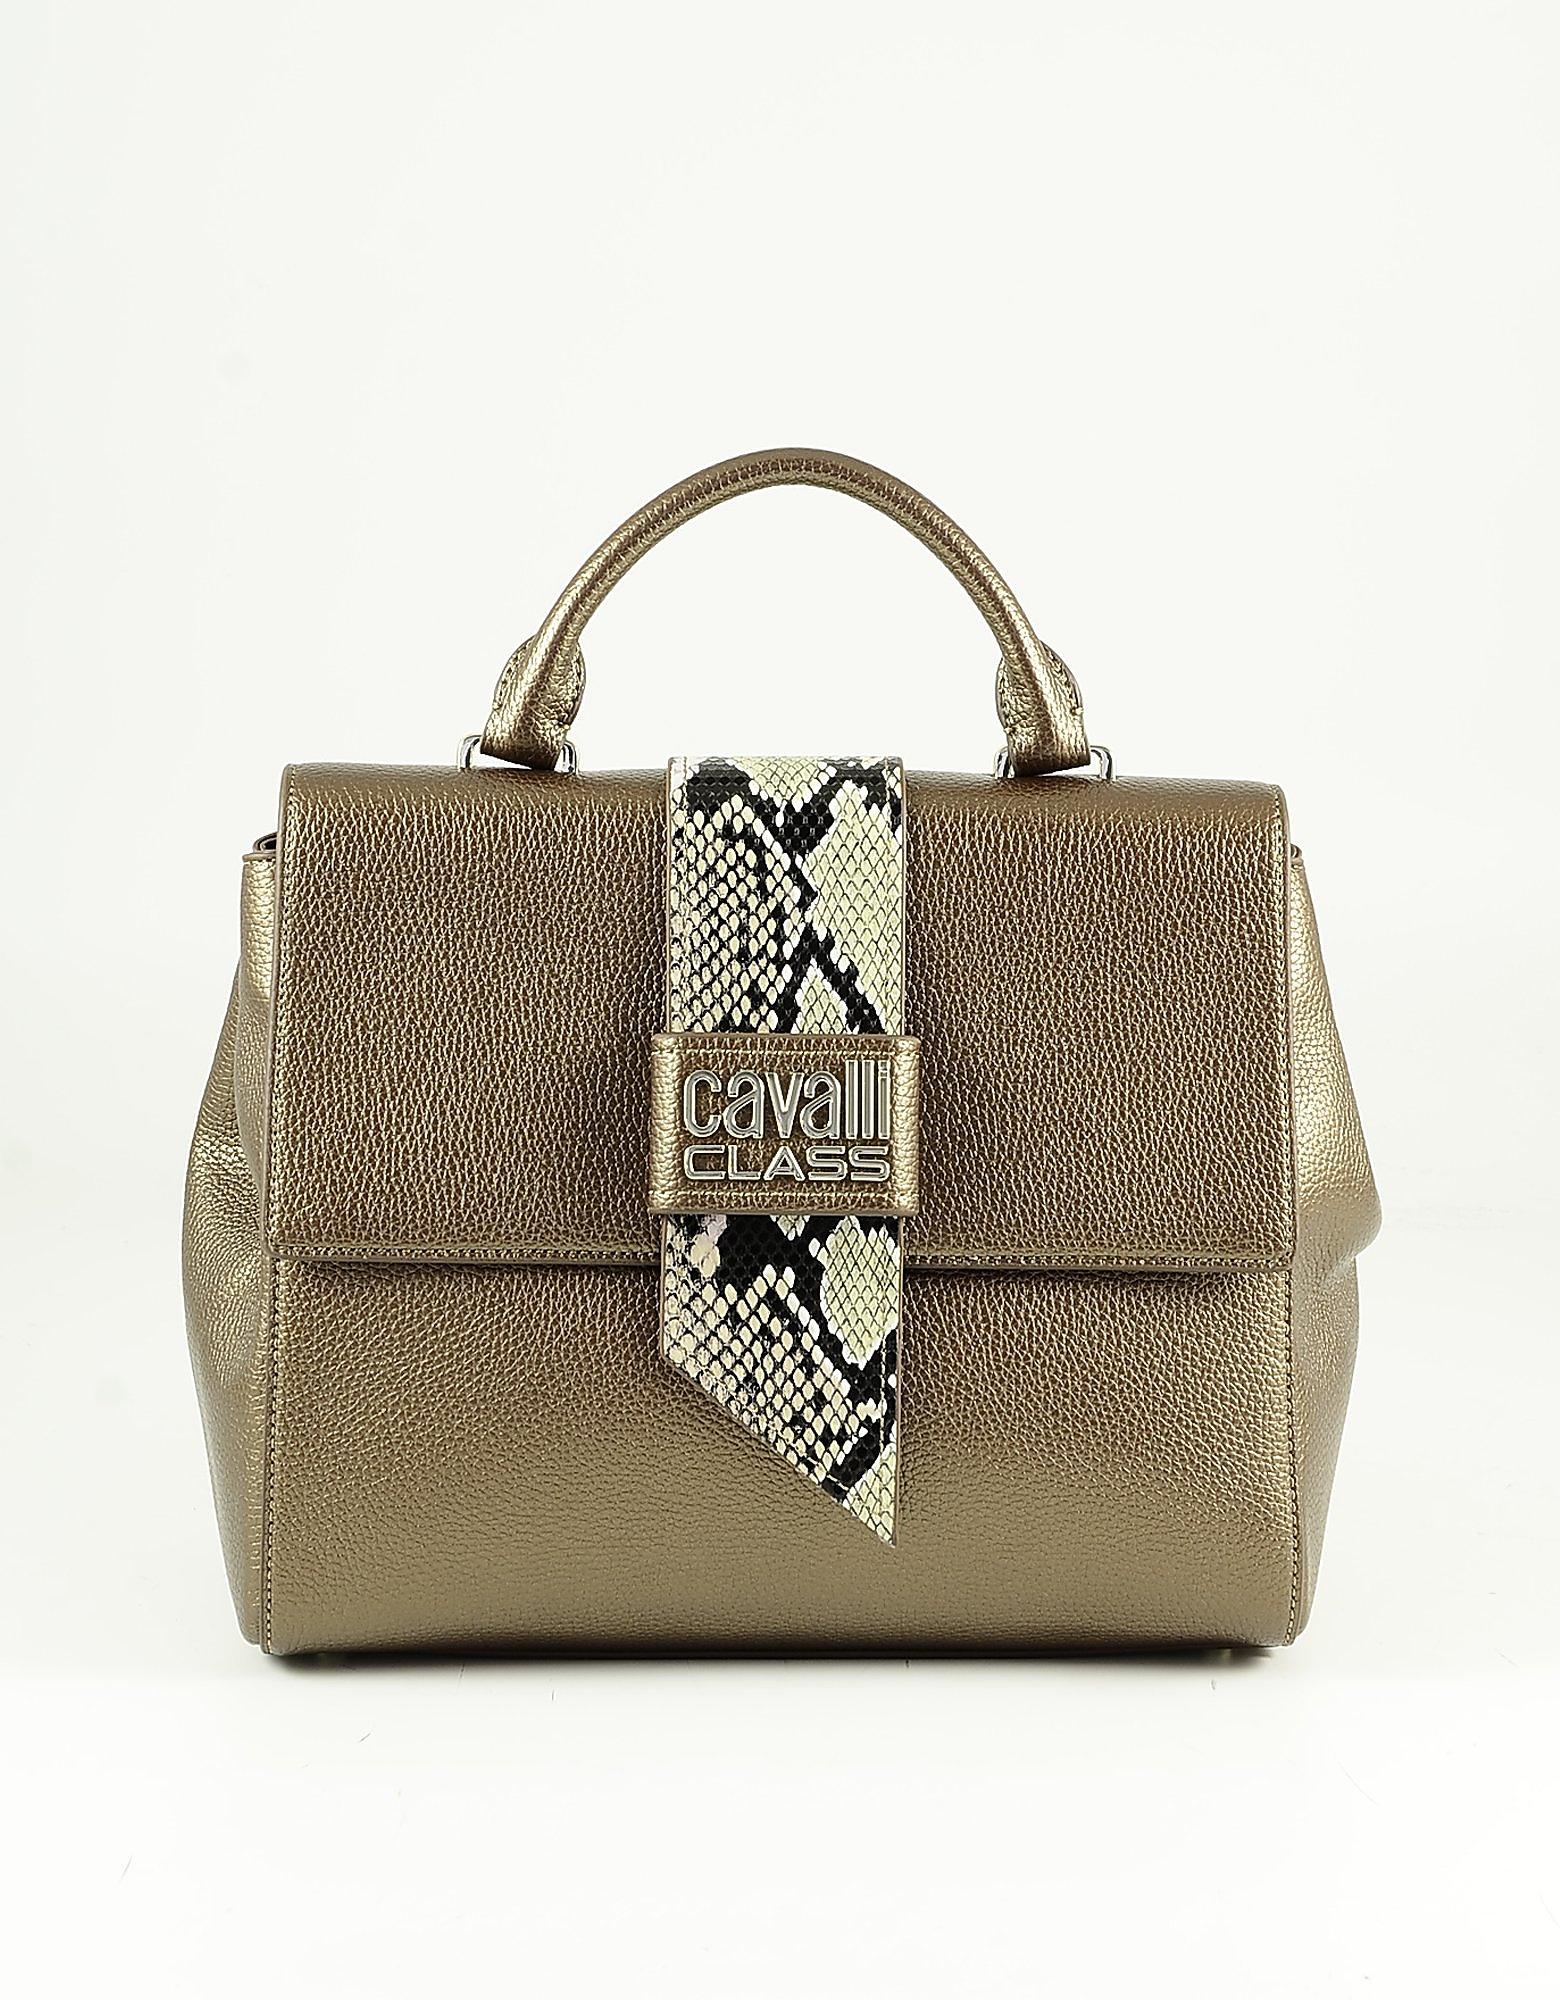 Class Roberto Cavalli Metallic Bronze Eco-leather Small Satchel Bag